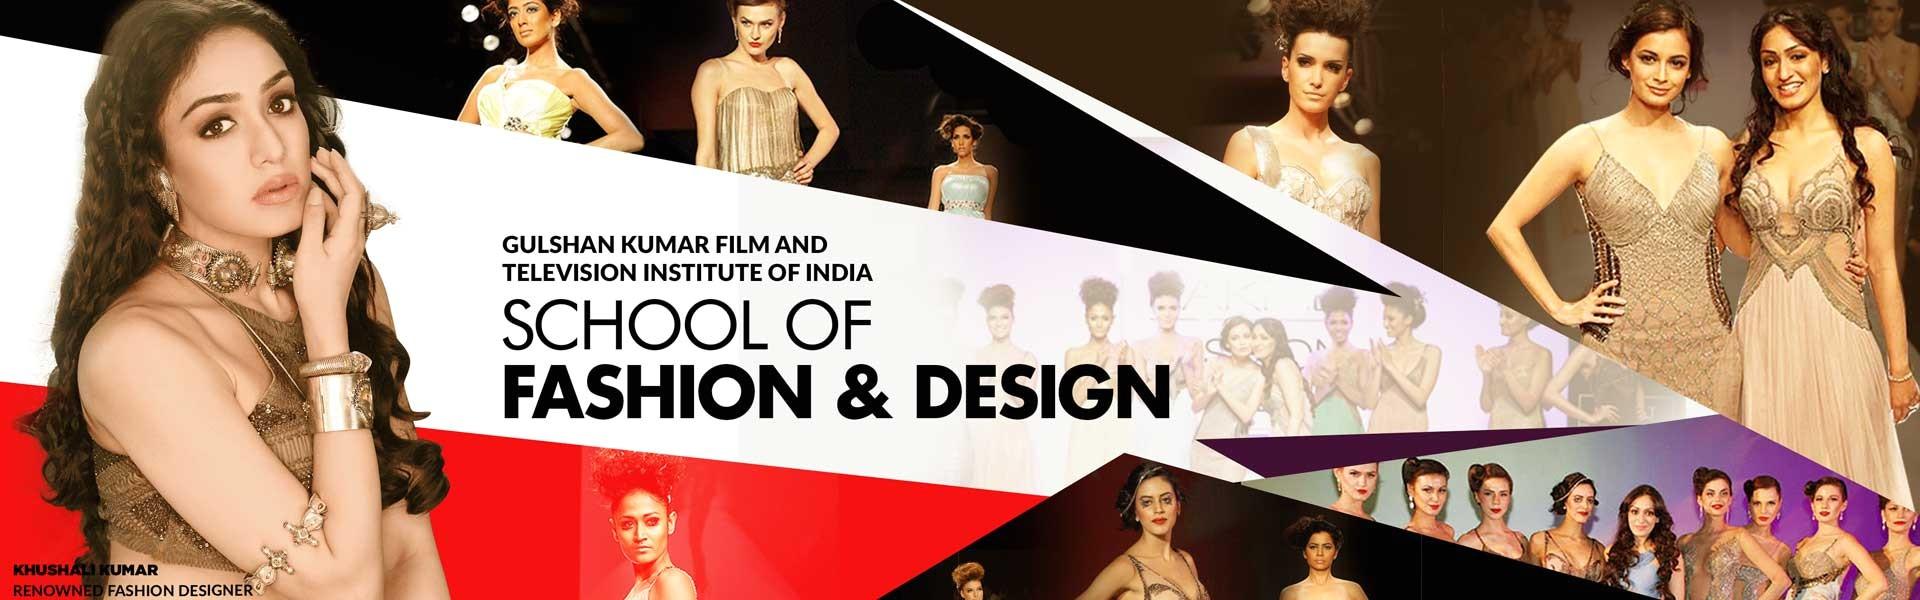 Gulshan kumar film & television institute of India- School of Film & Television